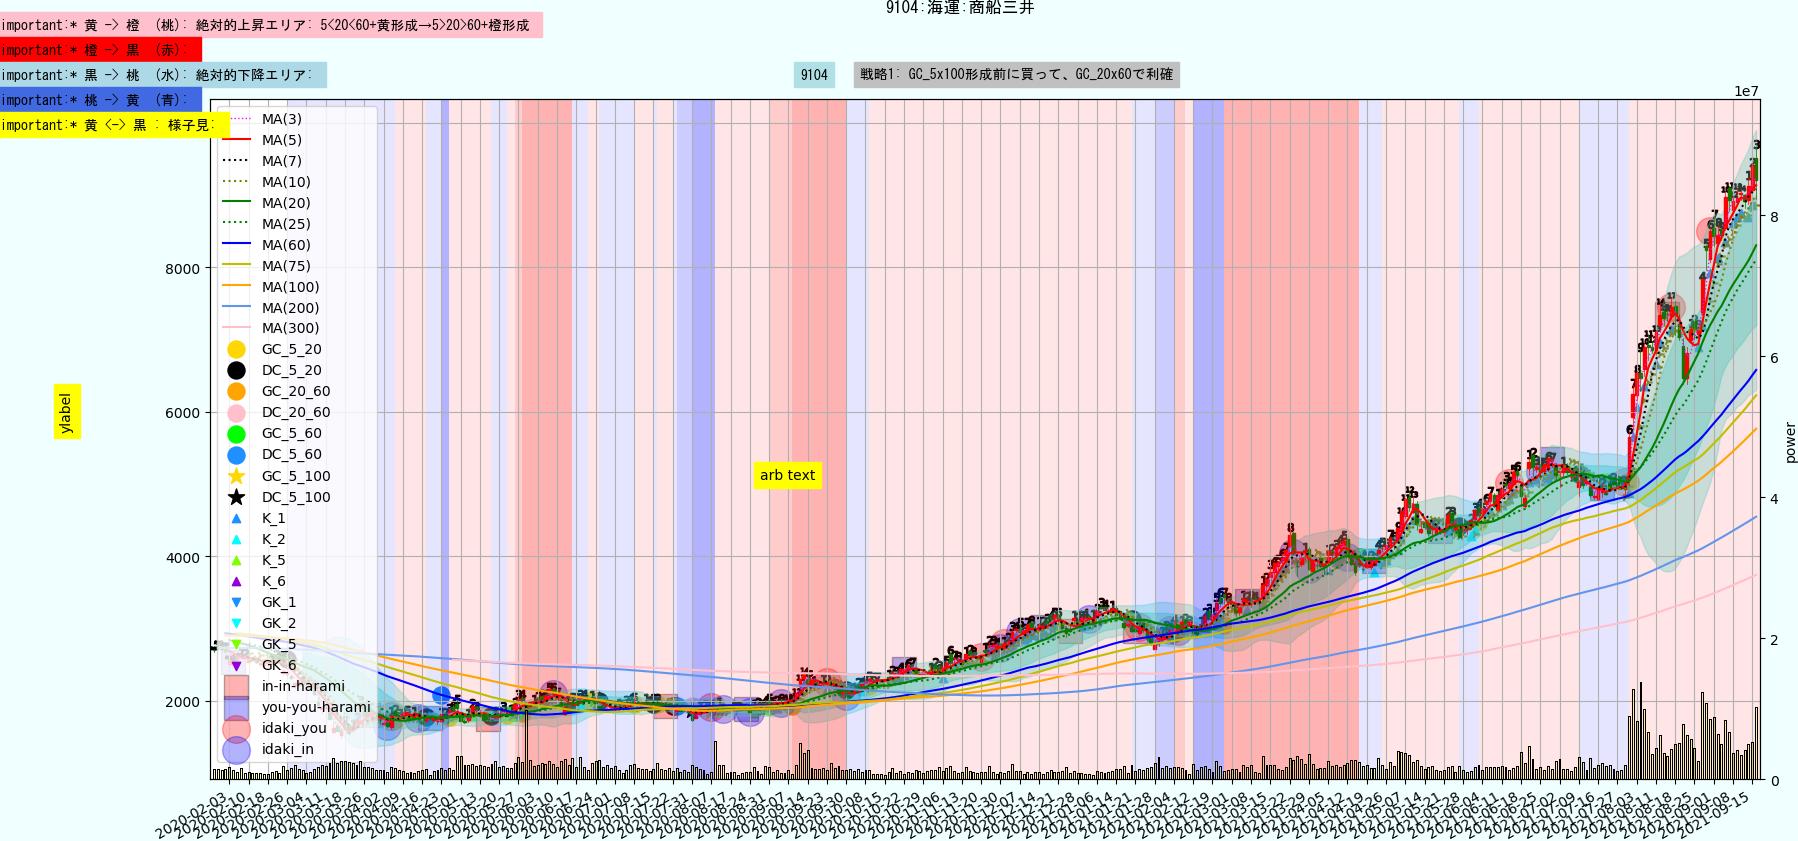 https://trident-capital-strage.s3.ap-northeast-1.amazonaws.com/charts/20210916/9104.png